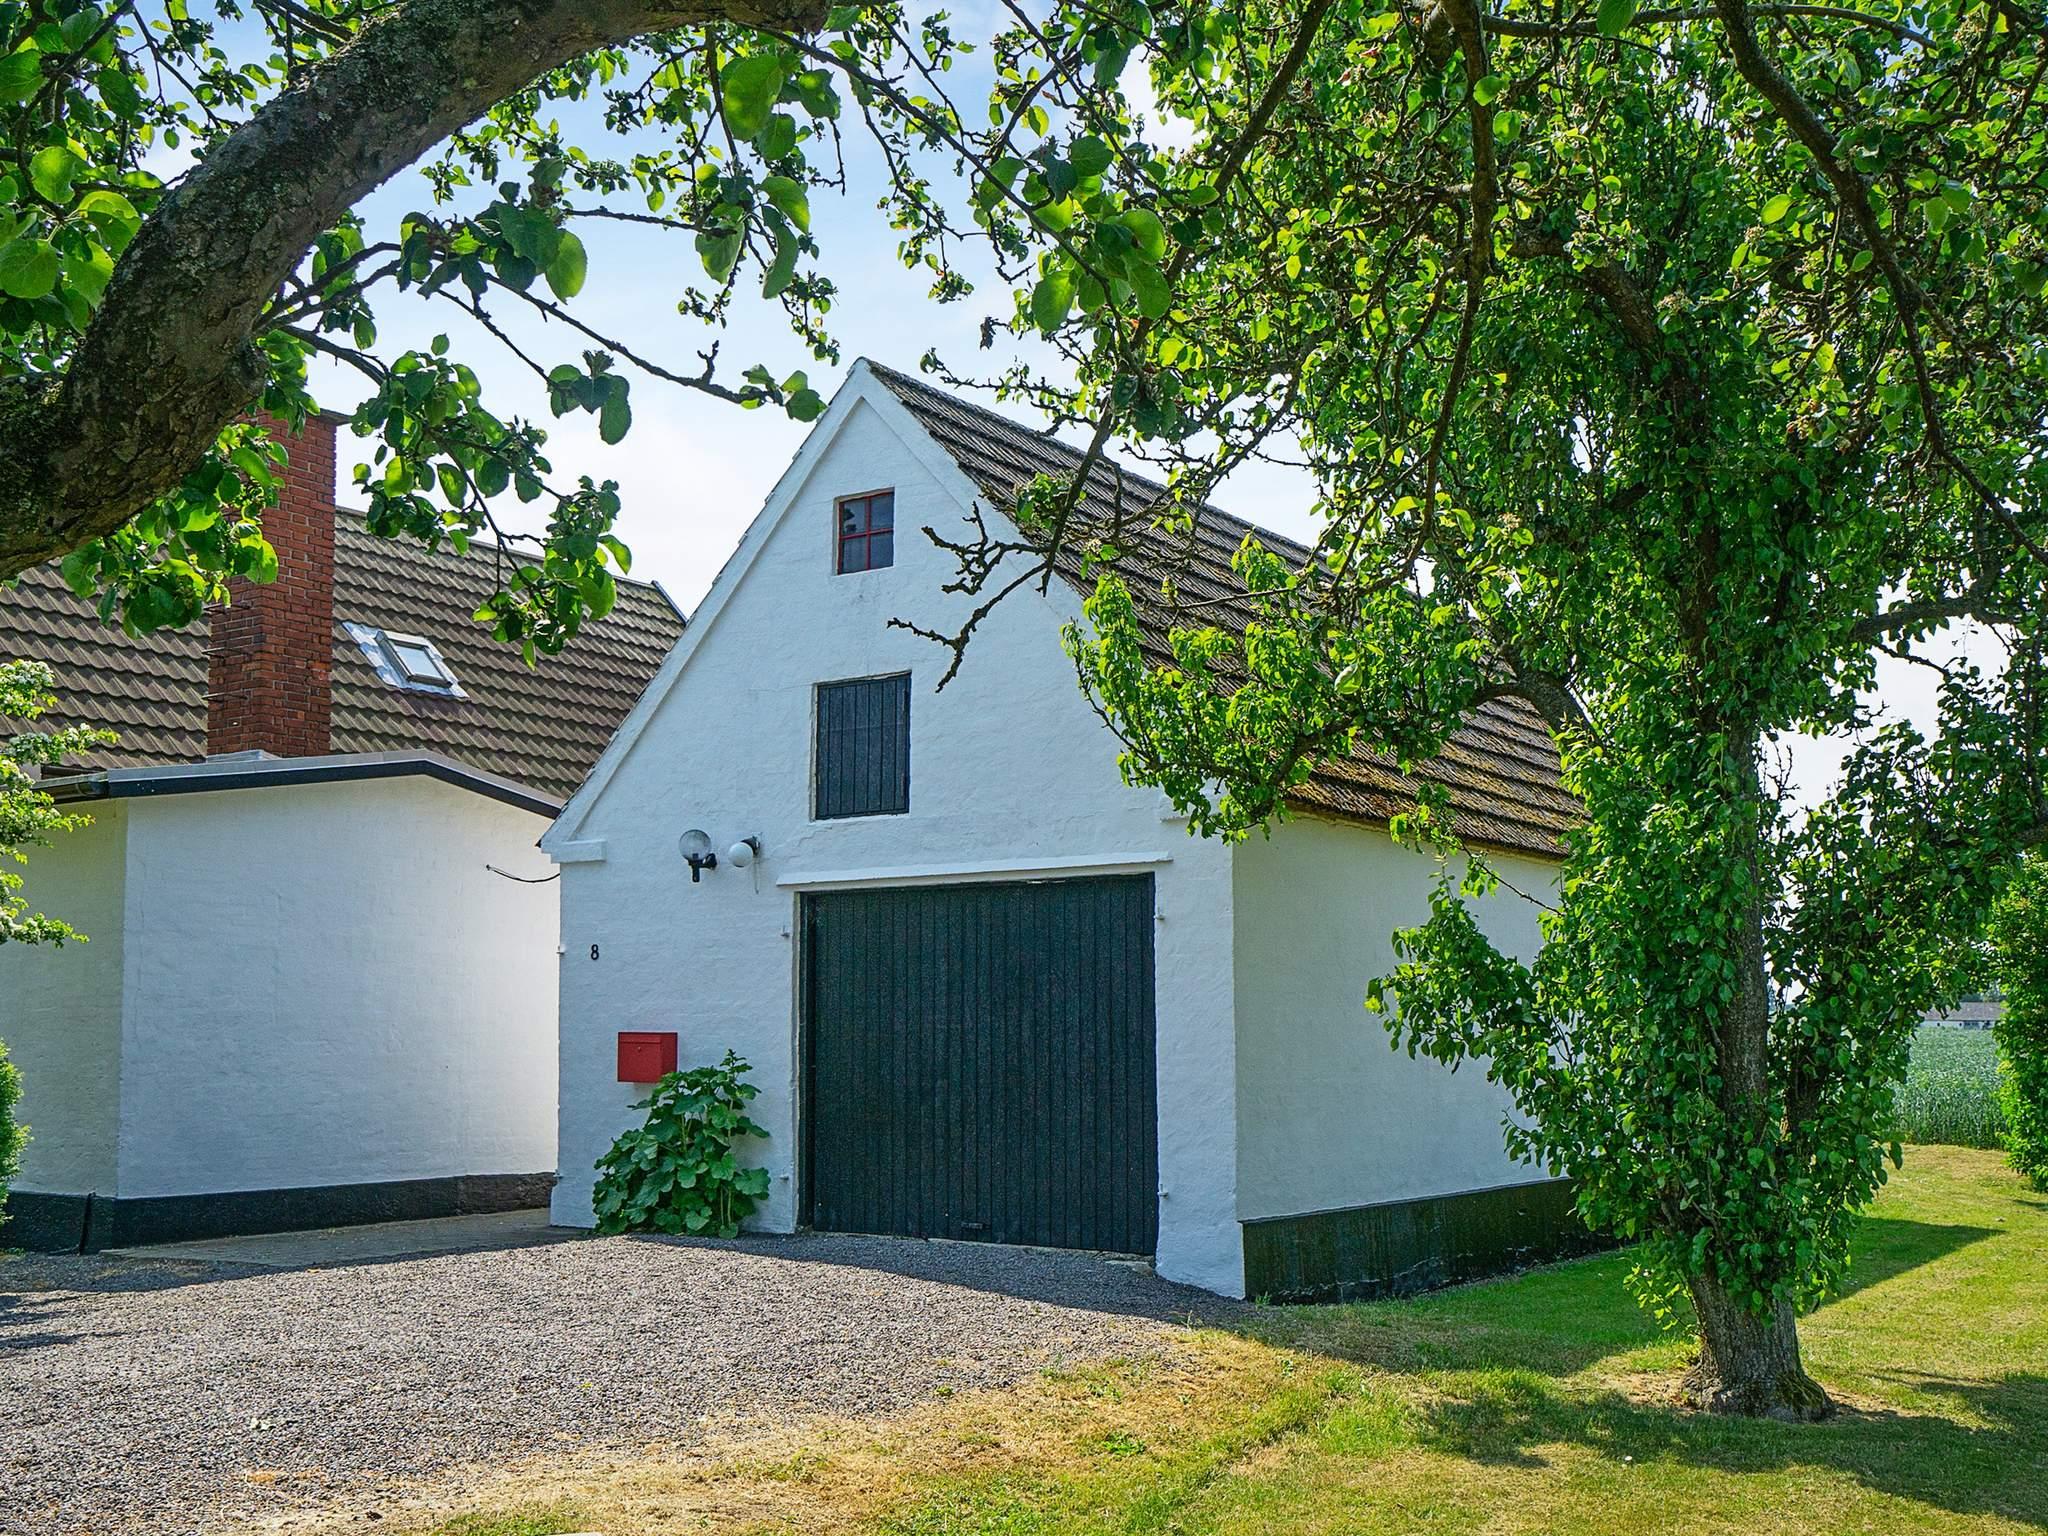 Ferienhaus Balka Strand (2429690), Balke, , Bornholm, Dänemark, Bild 20